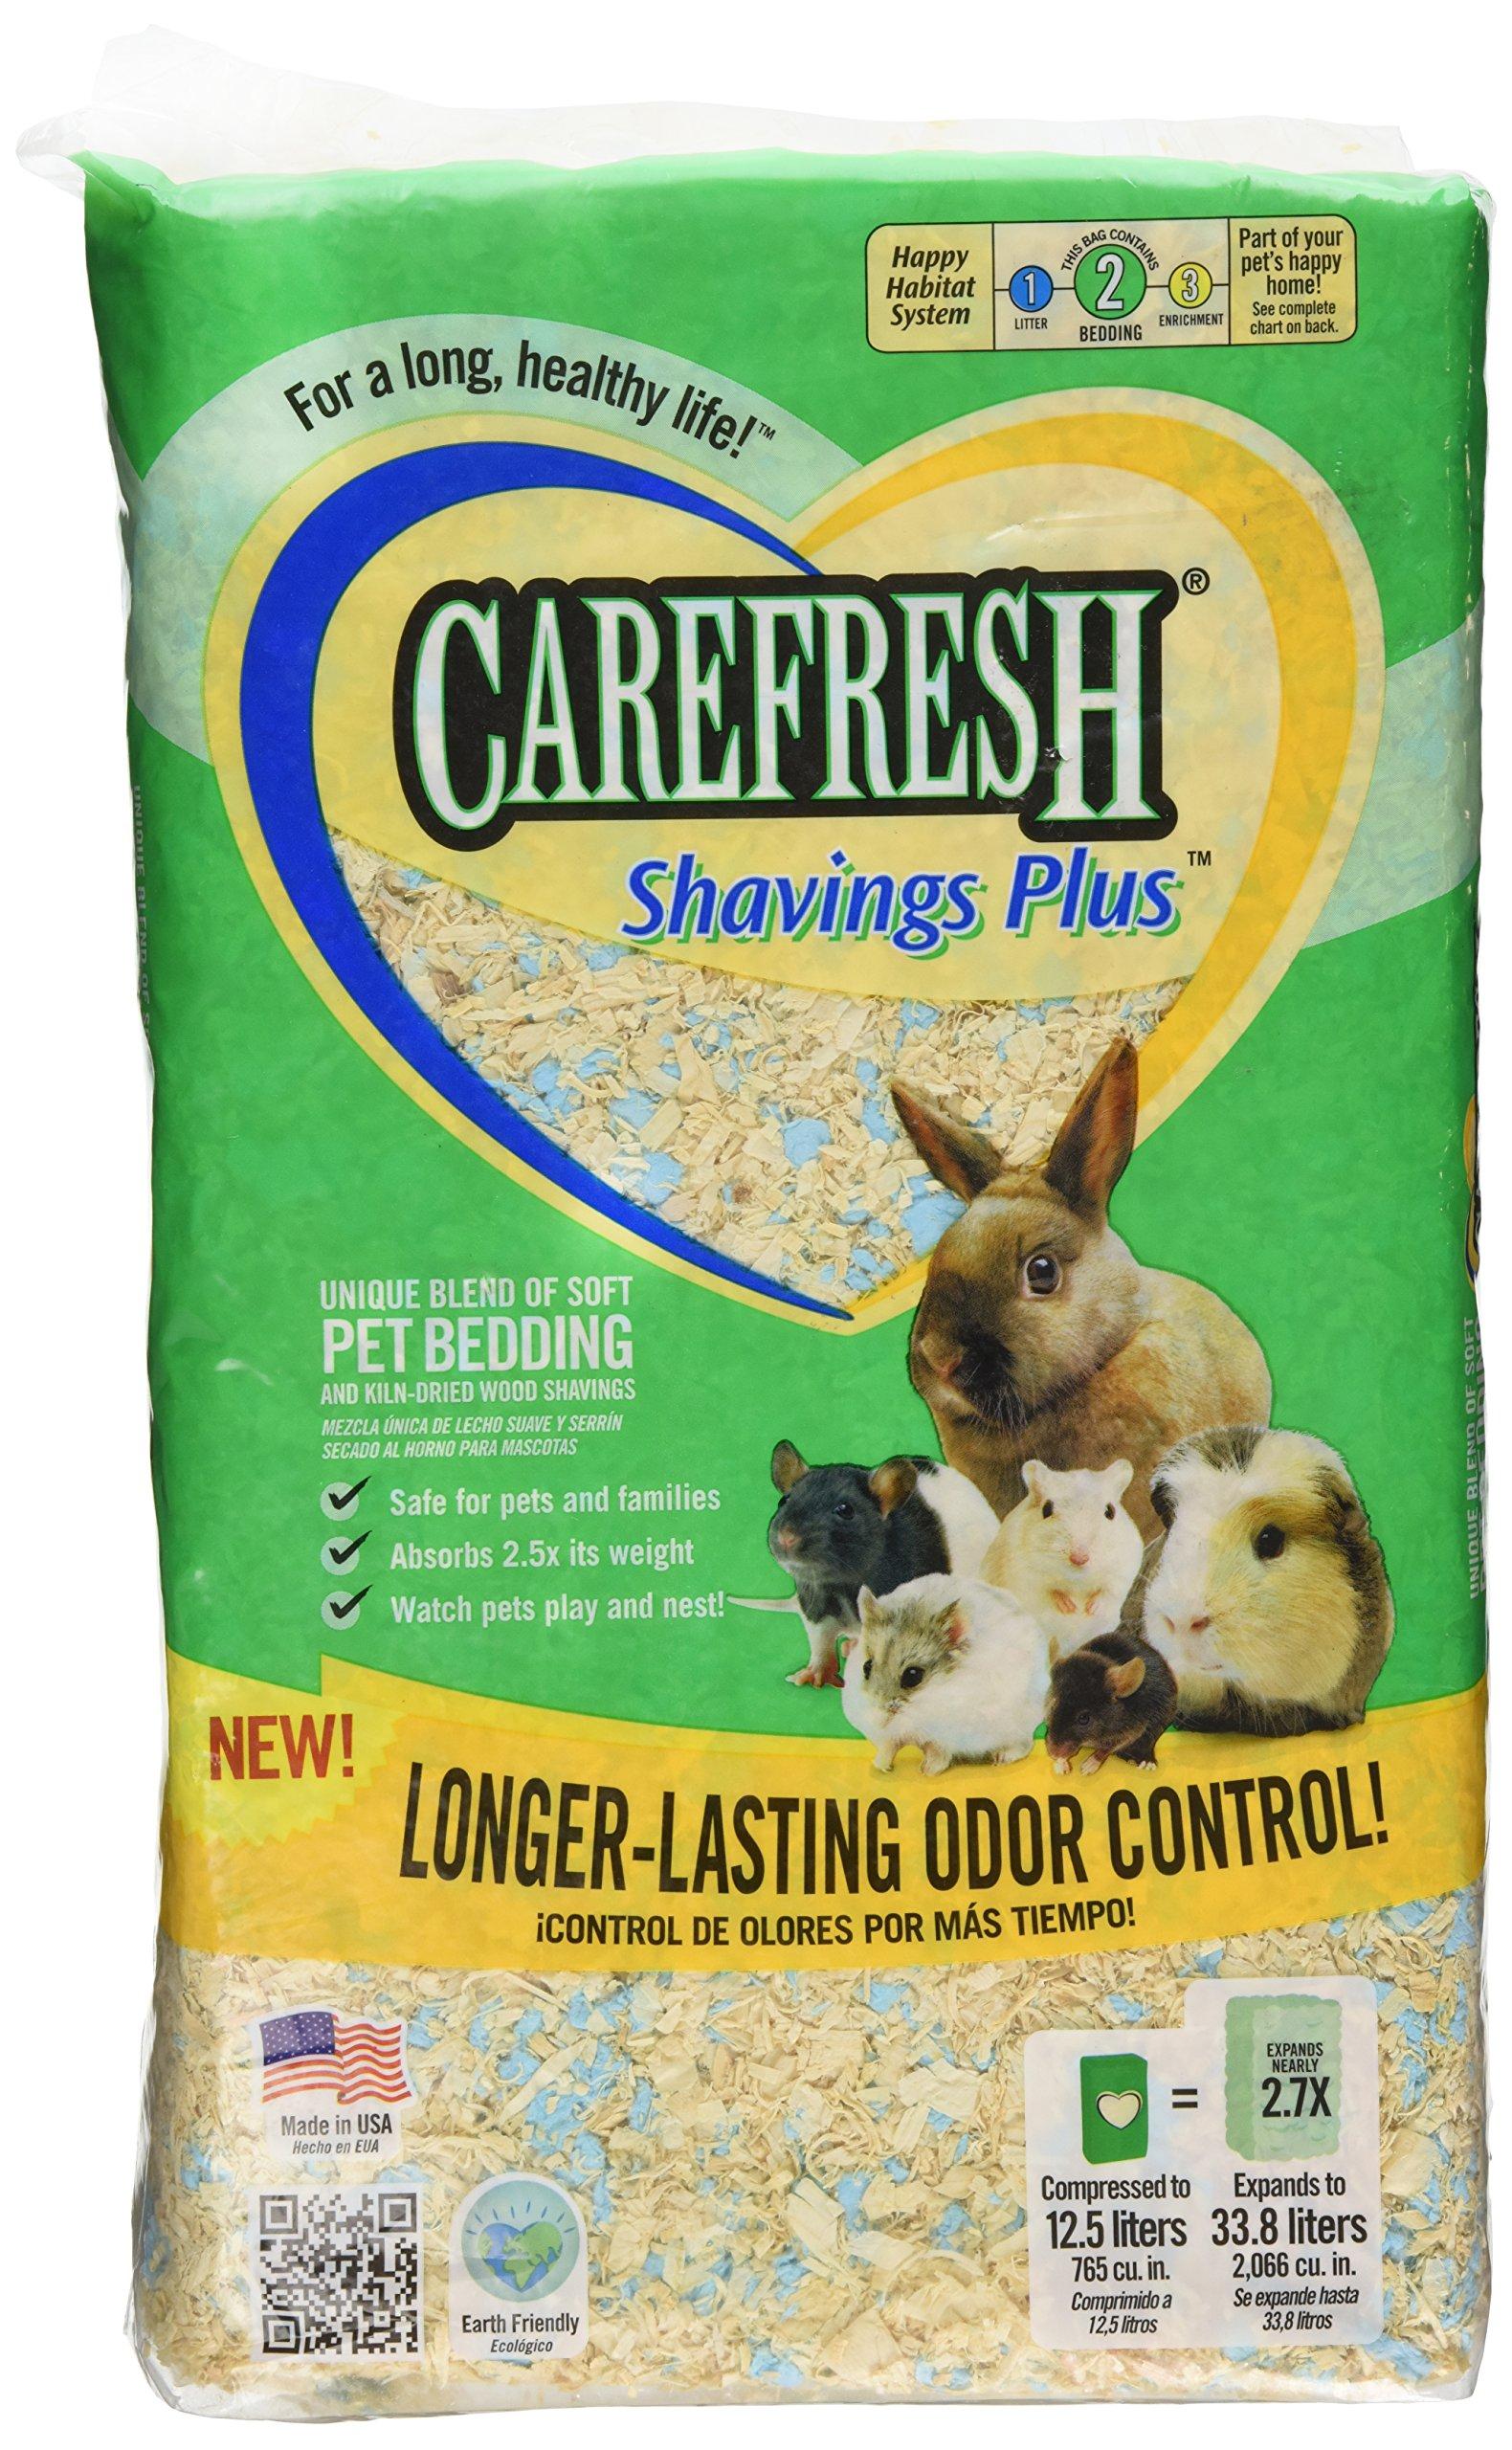 Absorbtion Corp Carefresh Shavings Plus Pet Bedding, 12.5-Liter